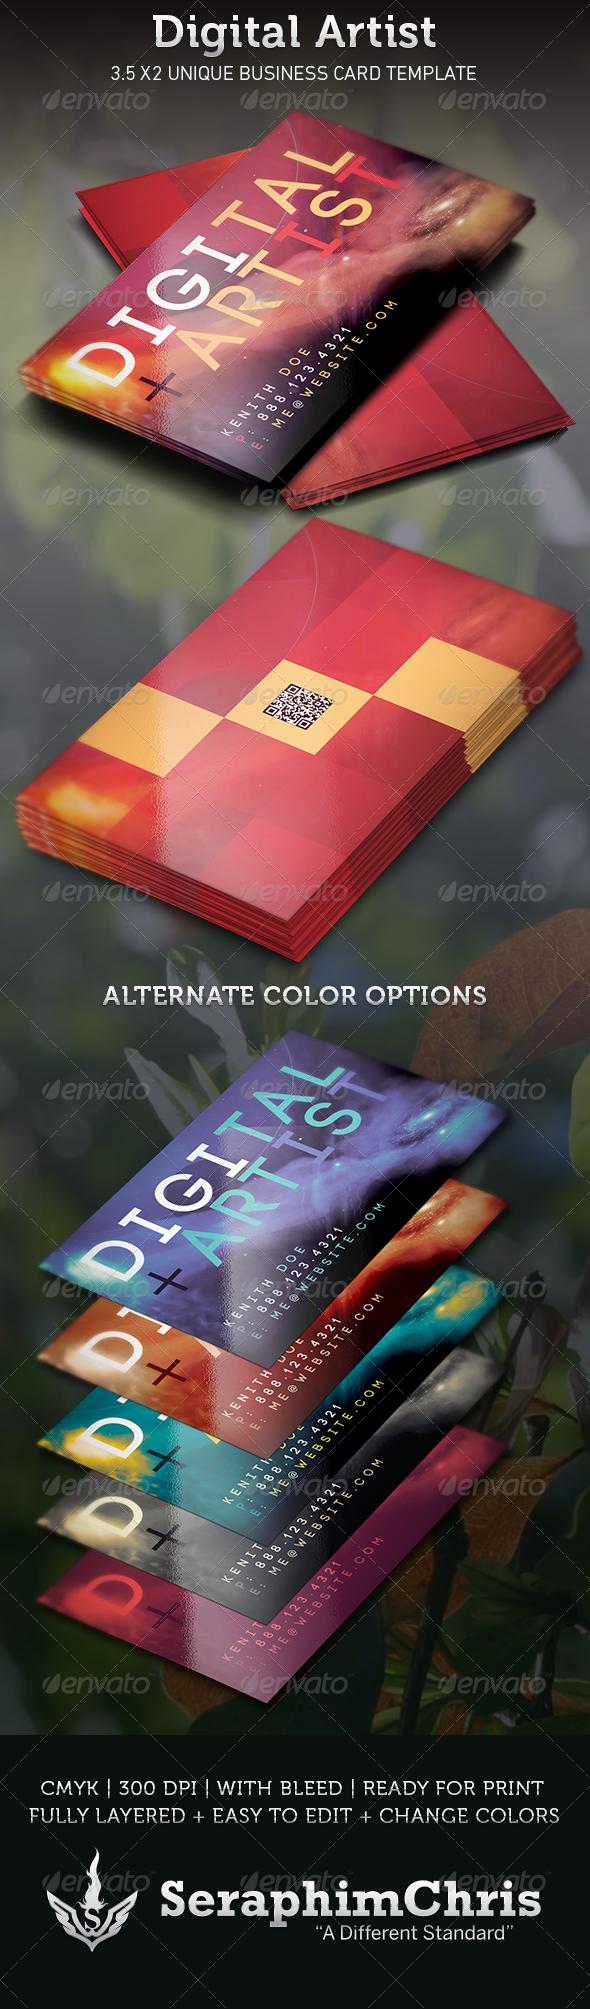 Digital Artist Business Card Template - Creative Business Cards